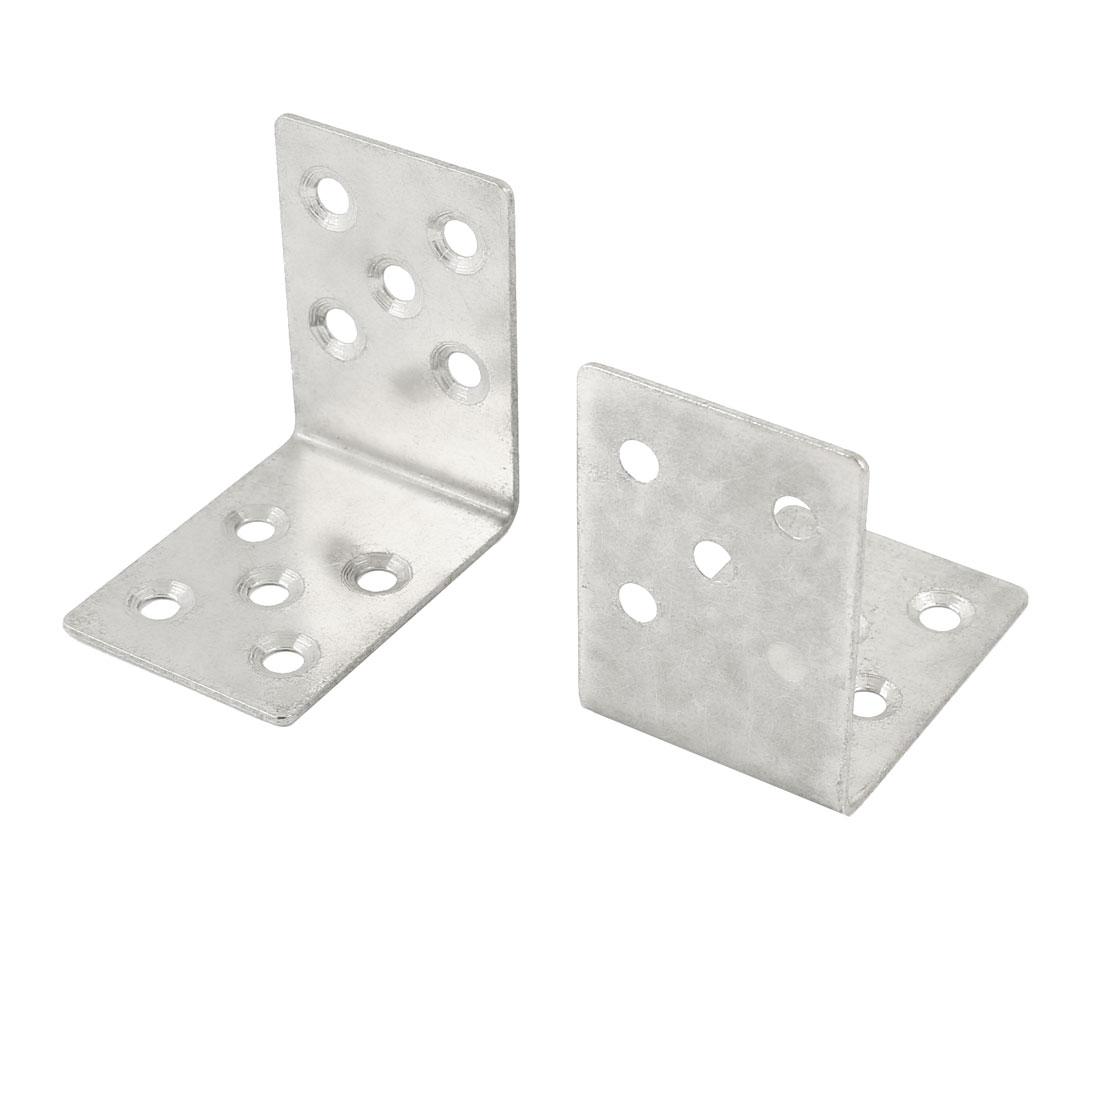 2 Pcs Silver Tone Right Angle Bracket Fastener 5cm x 5cm